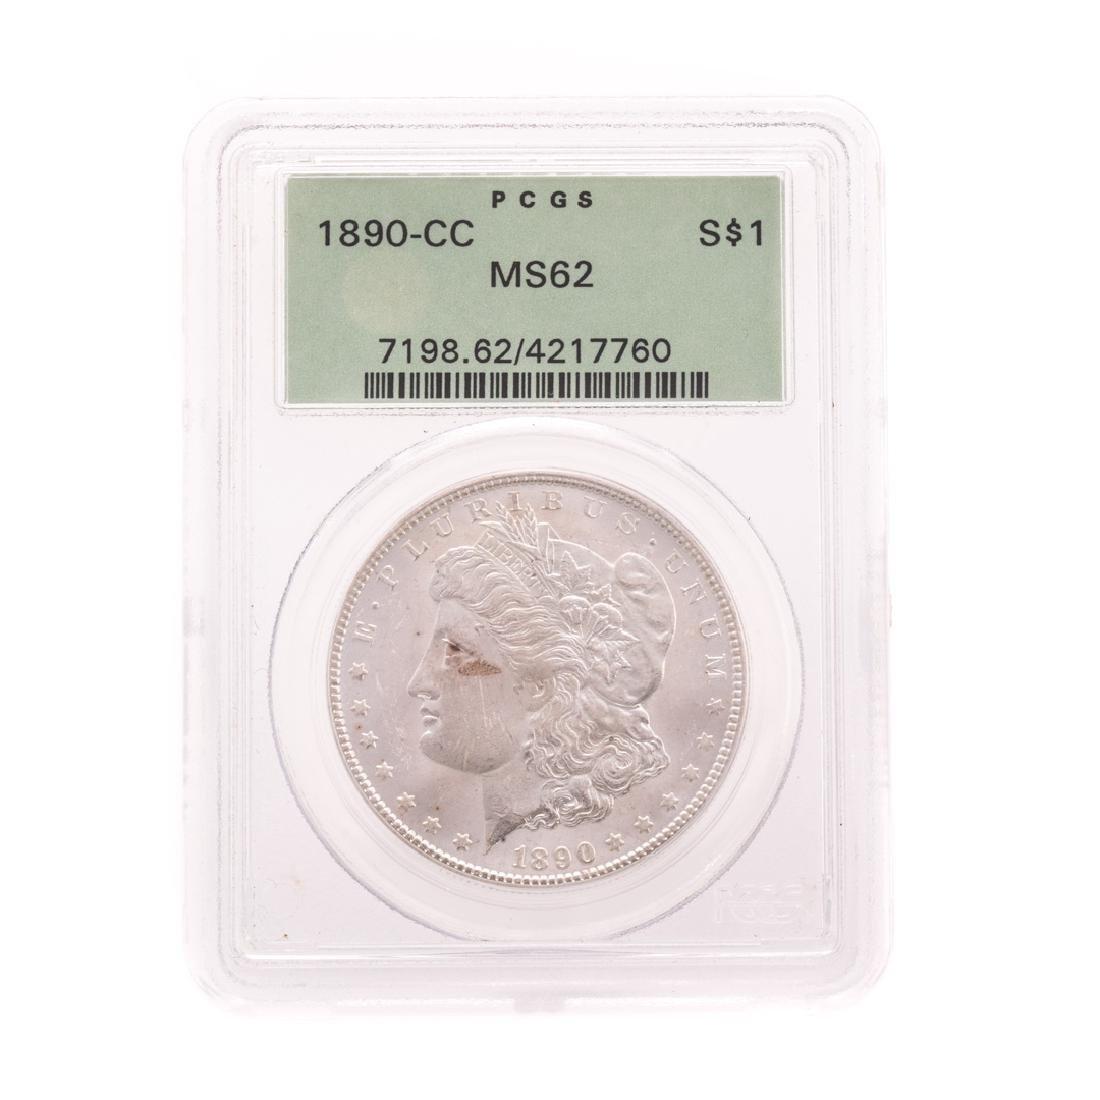 [US] 1890-CC Morgan Dollar PCGS 62